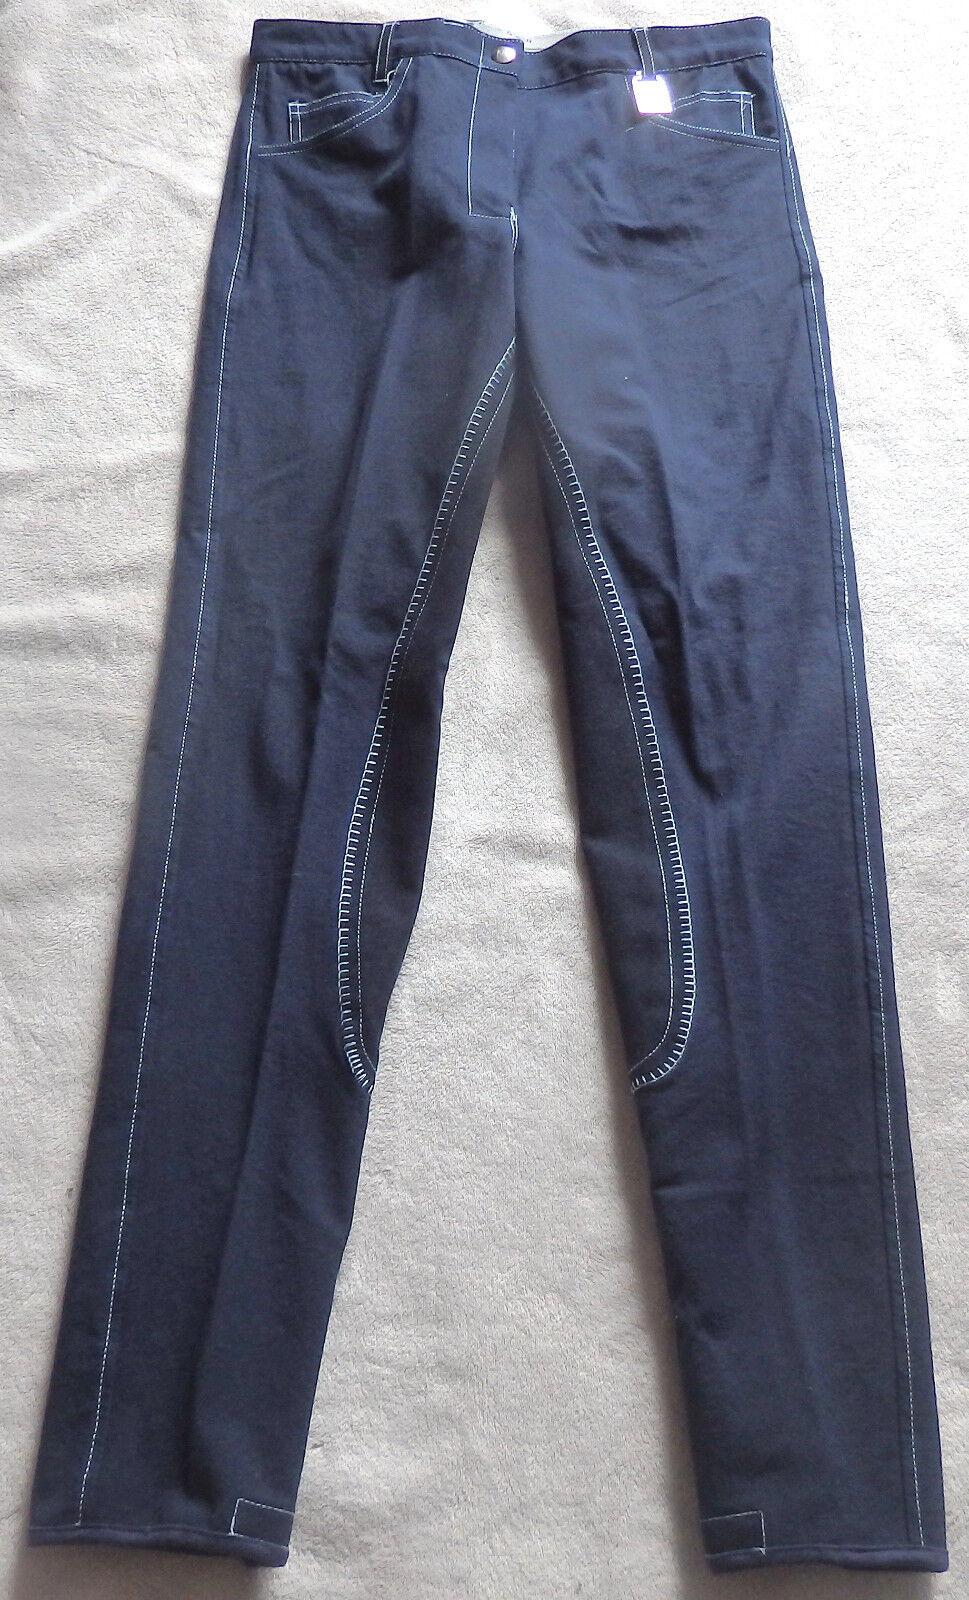 Kyron Damen Reithose mit 3/4 Vollbesatz ,blau, Roxy,Gr.80,  (18) (18)  2318ff